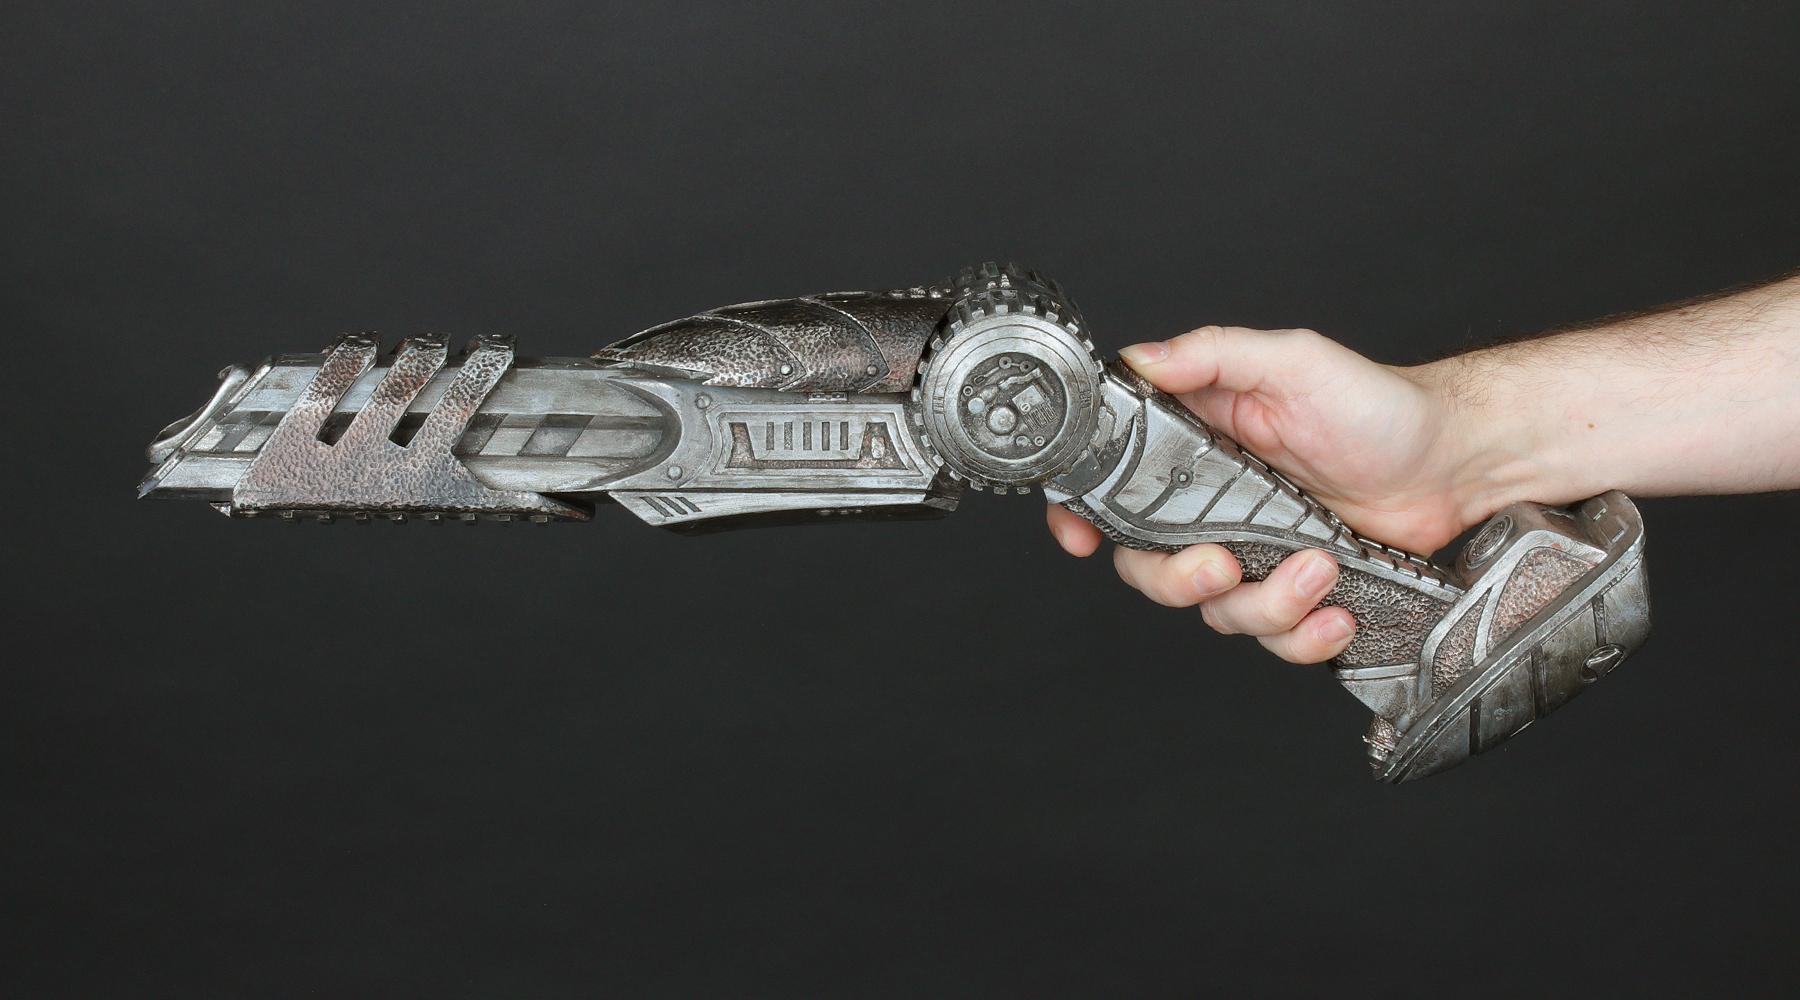 avpr-wolf-predator-plasma-cannon-04.jpg